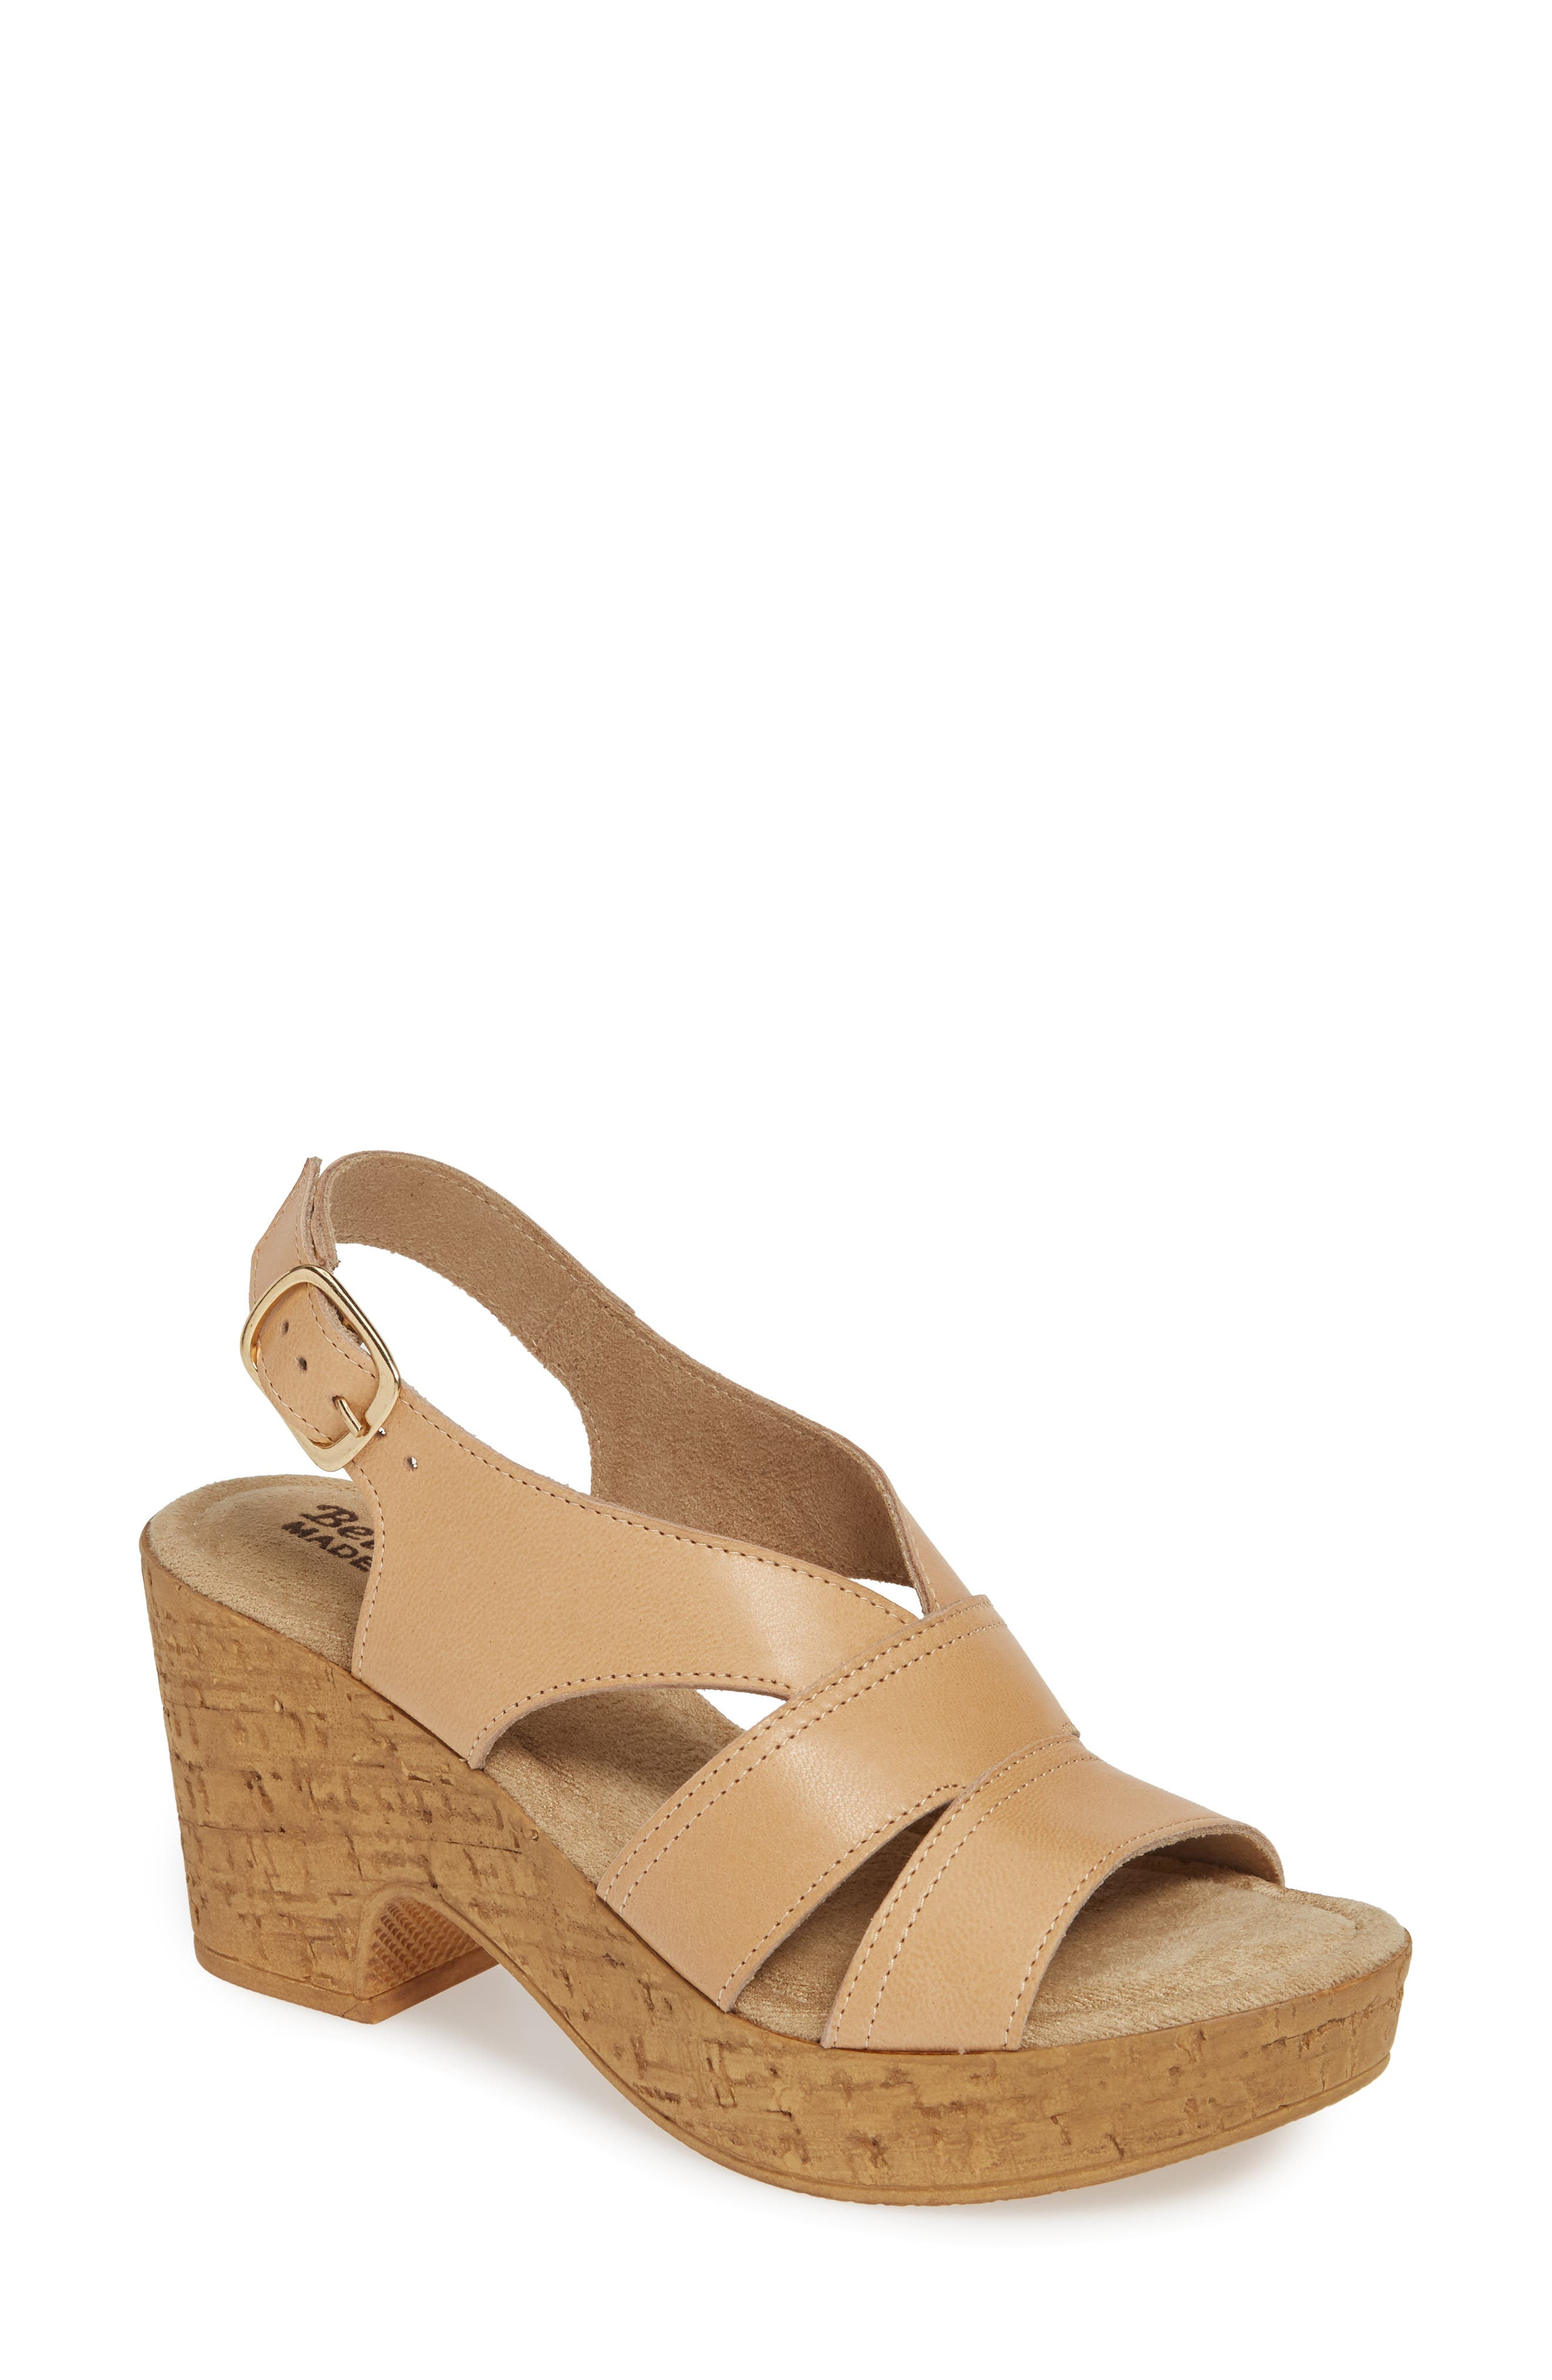 Bella Vita Jaz Platform Sandal, Beige